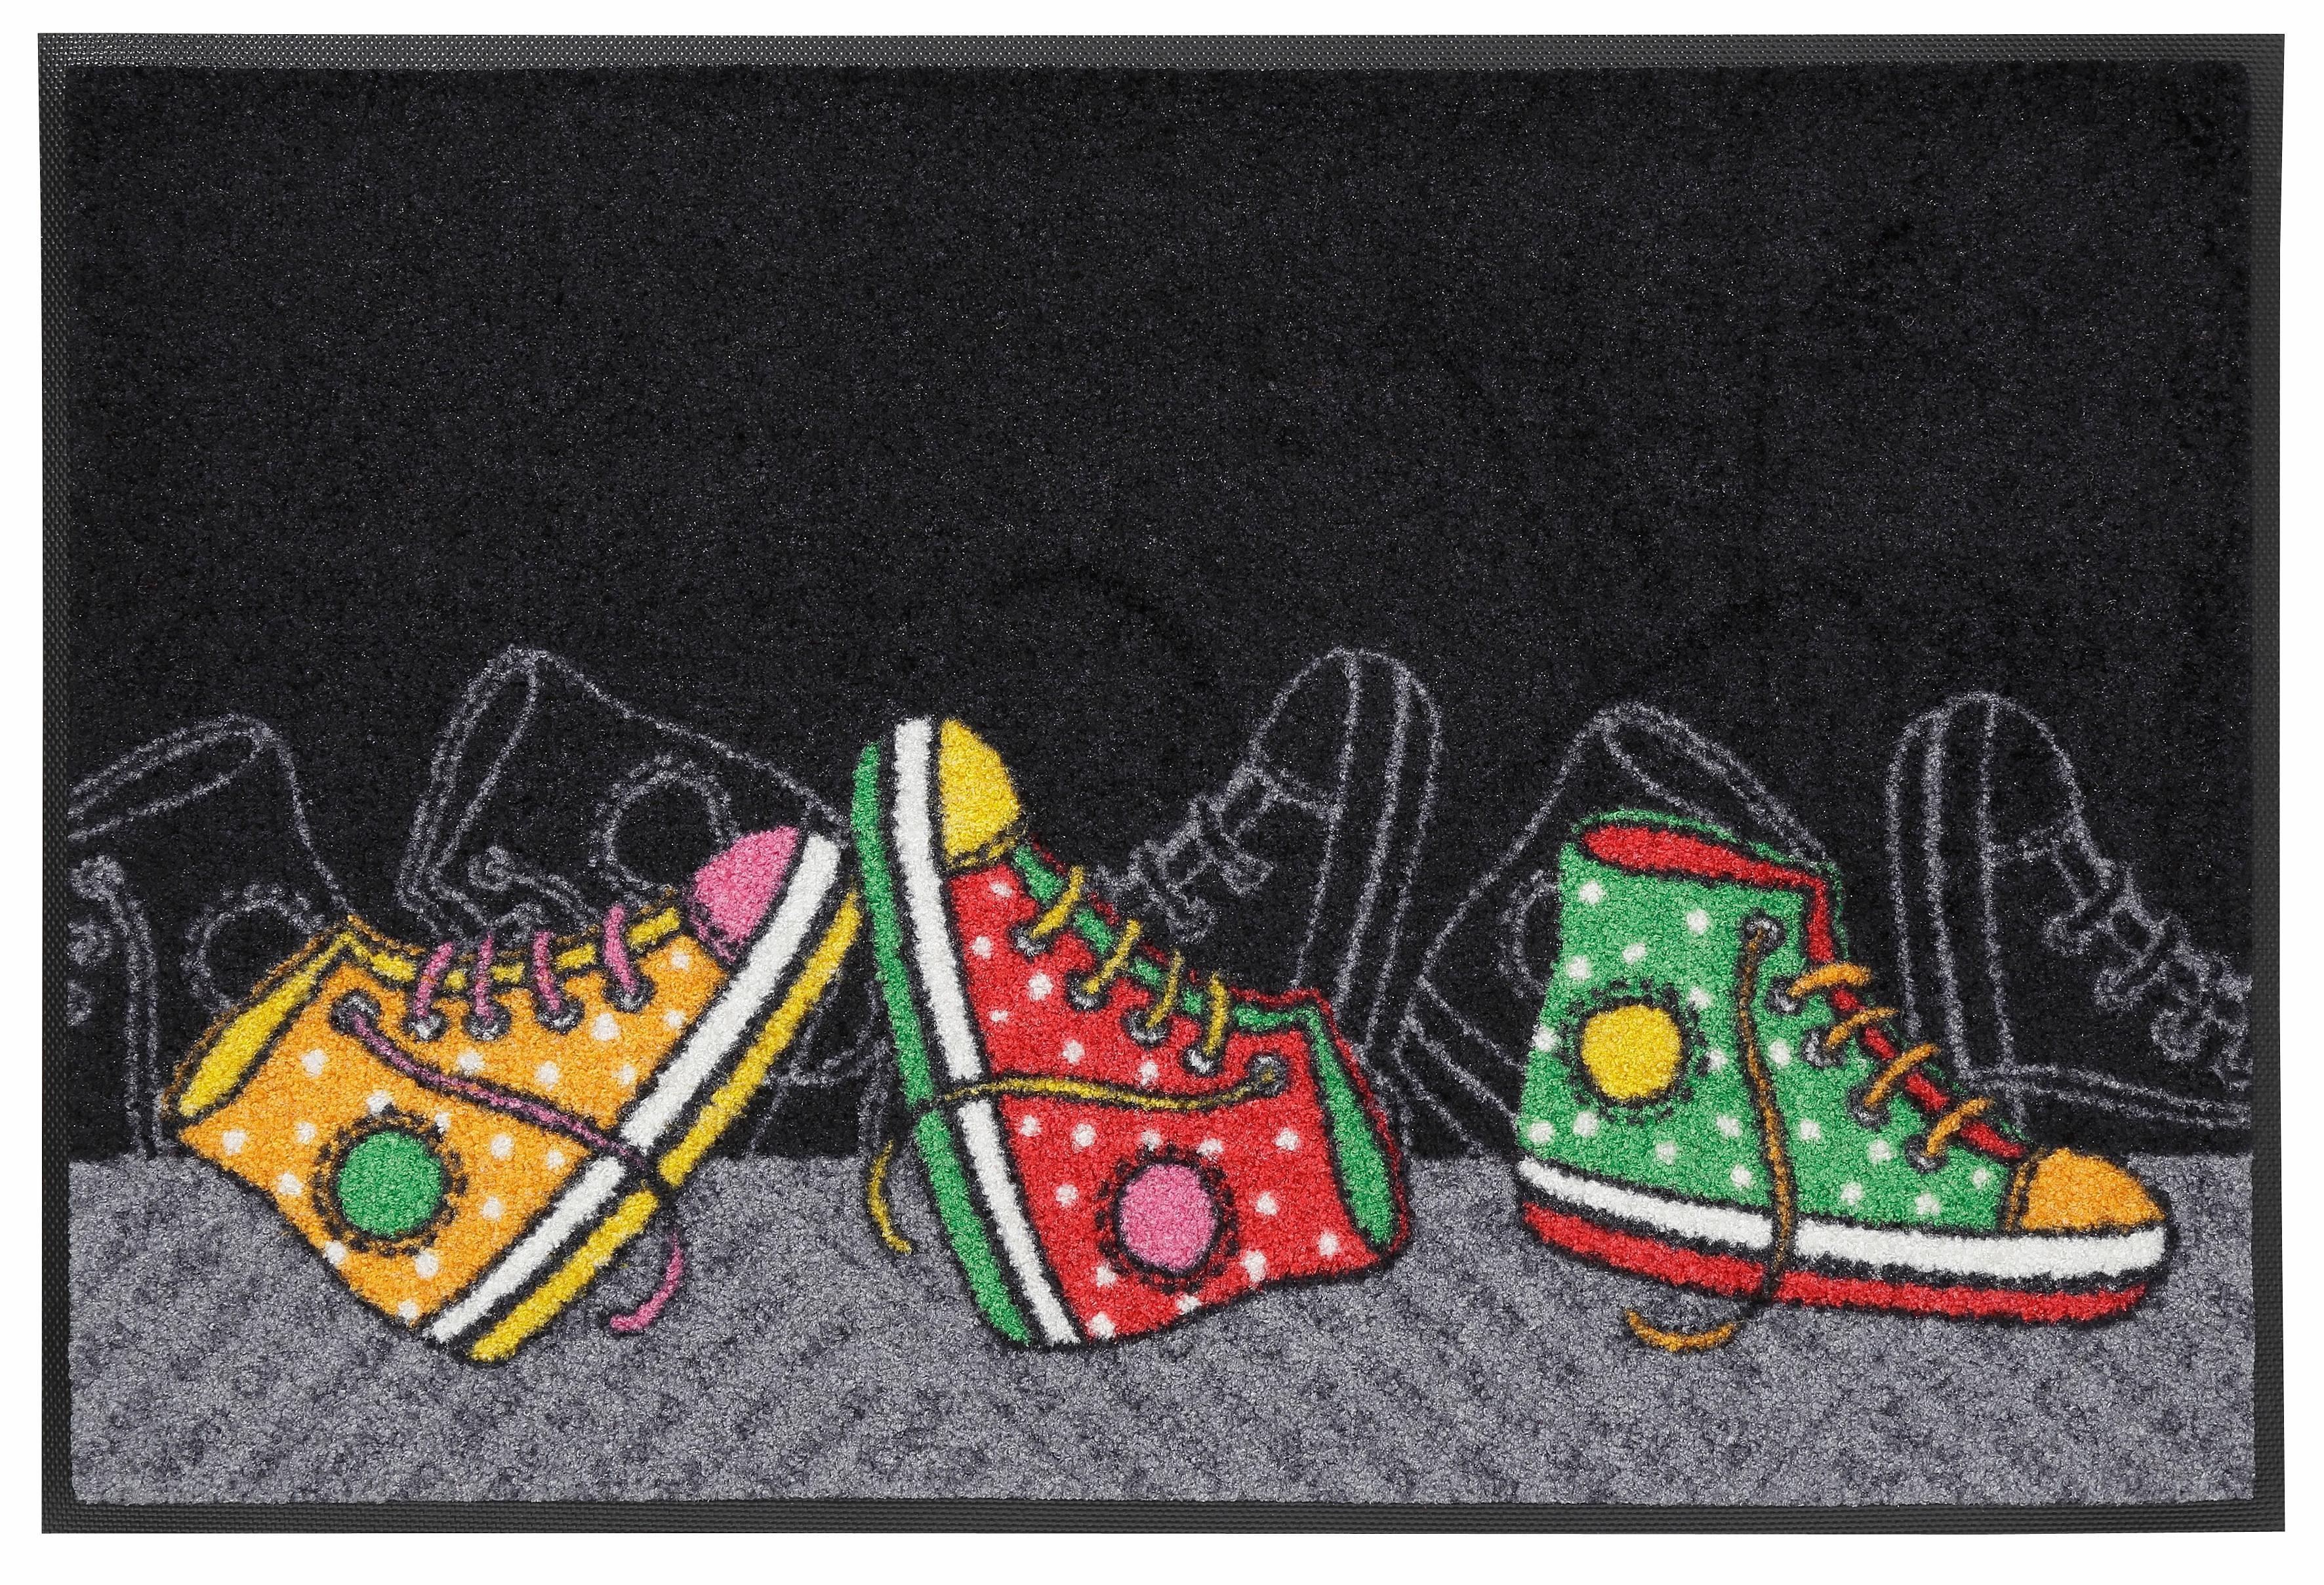 Fußmatte »Happy Sneakers«, wash+dry by Kleen-Tex, rechteckig, Höhe 7 mm